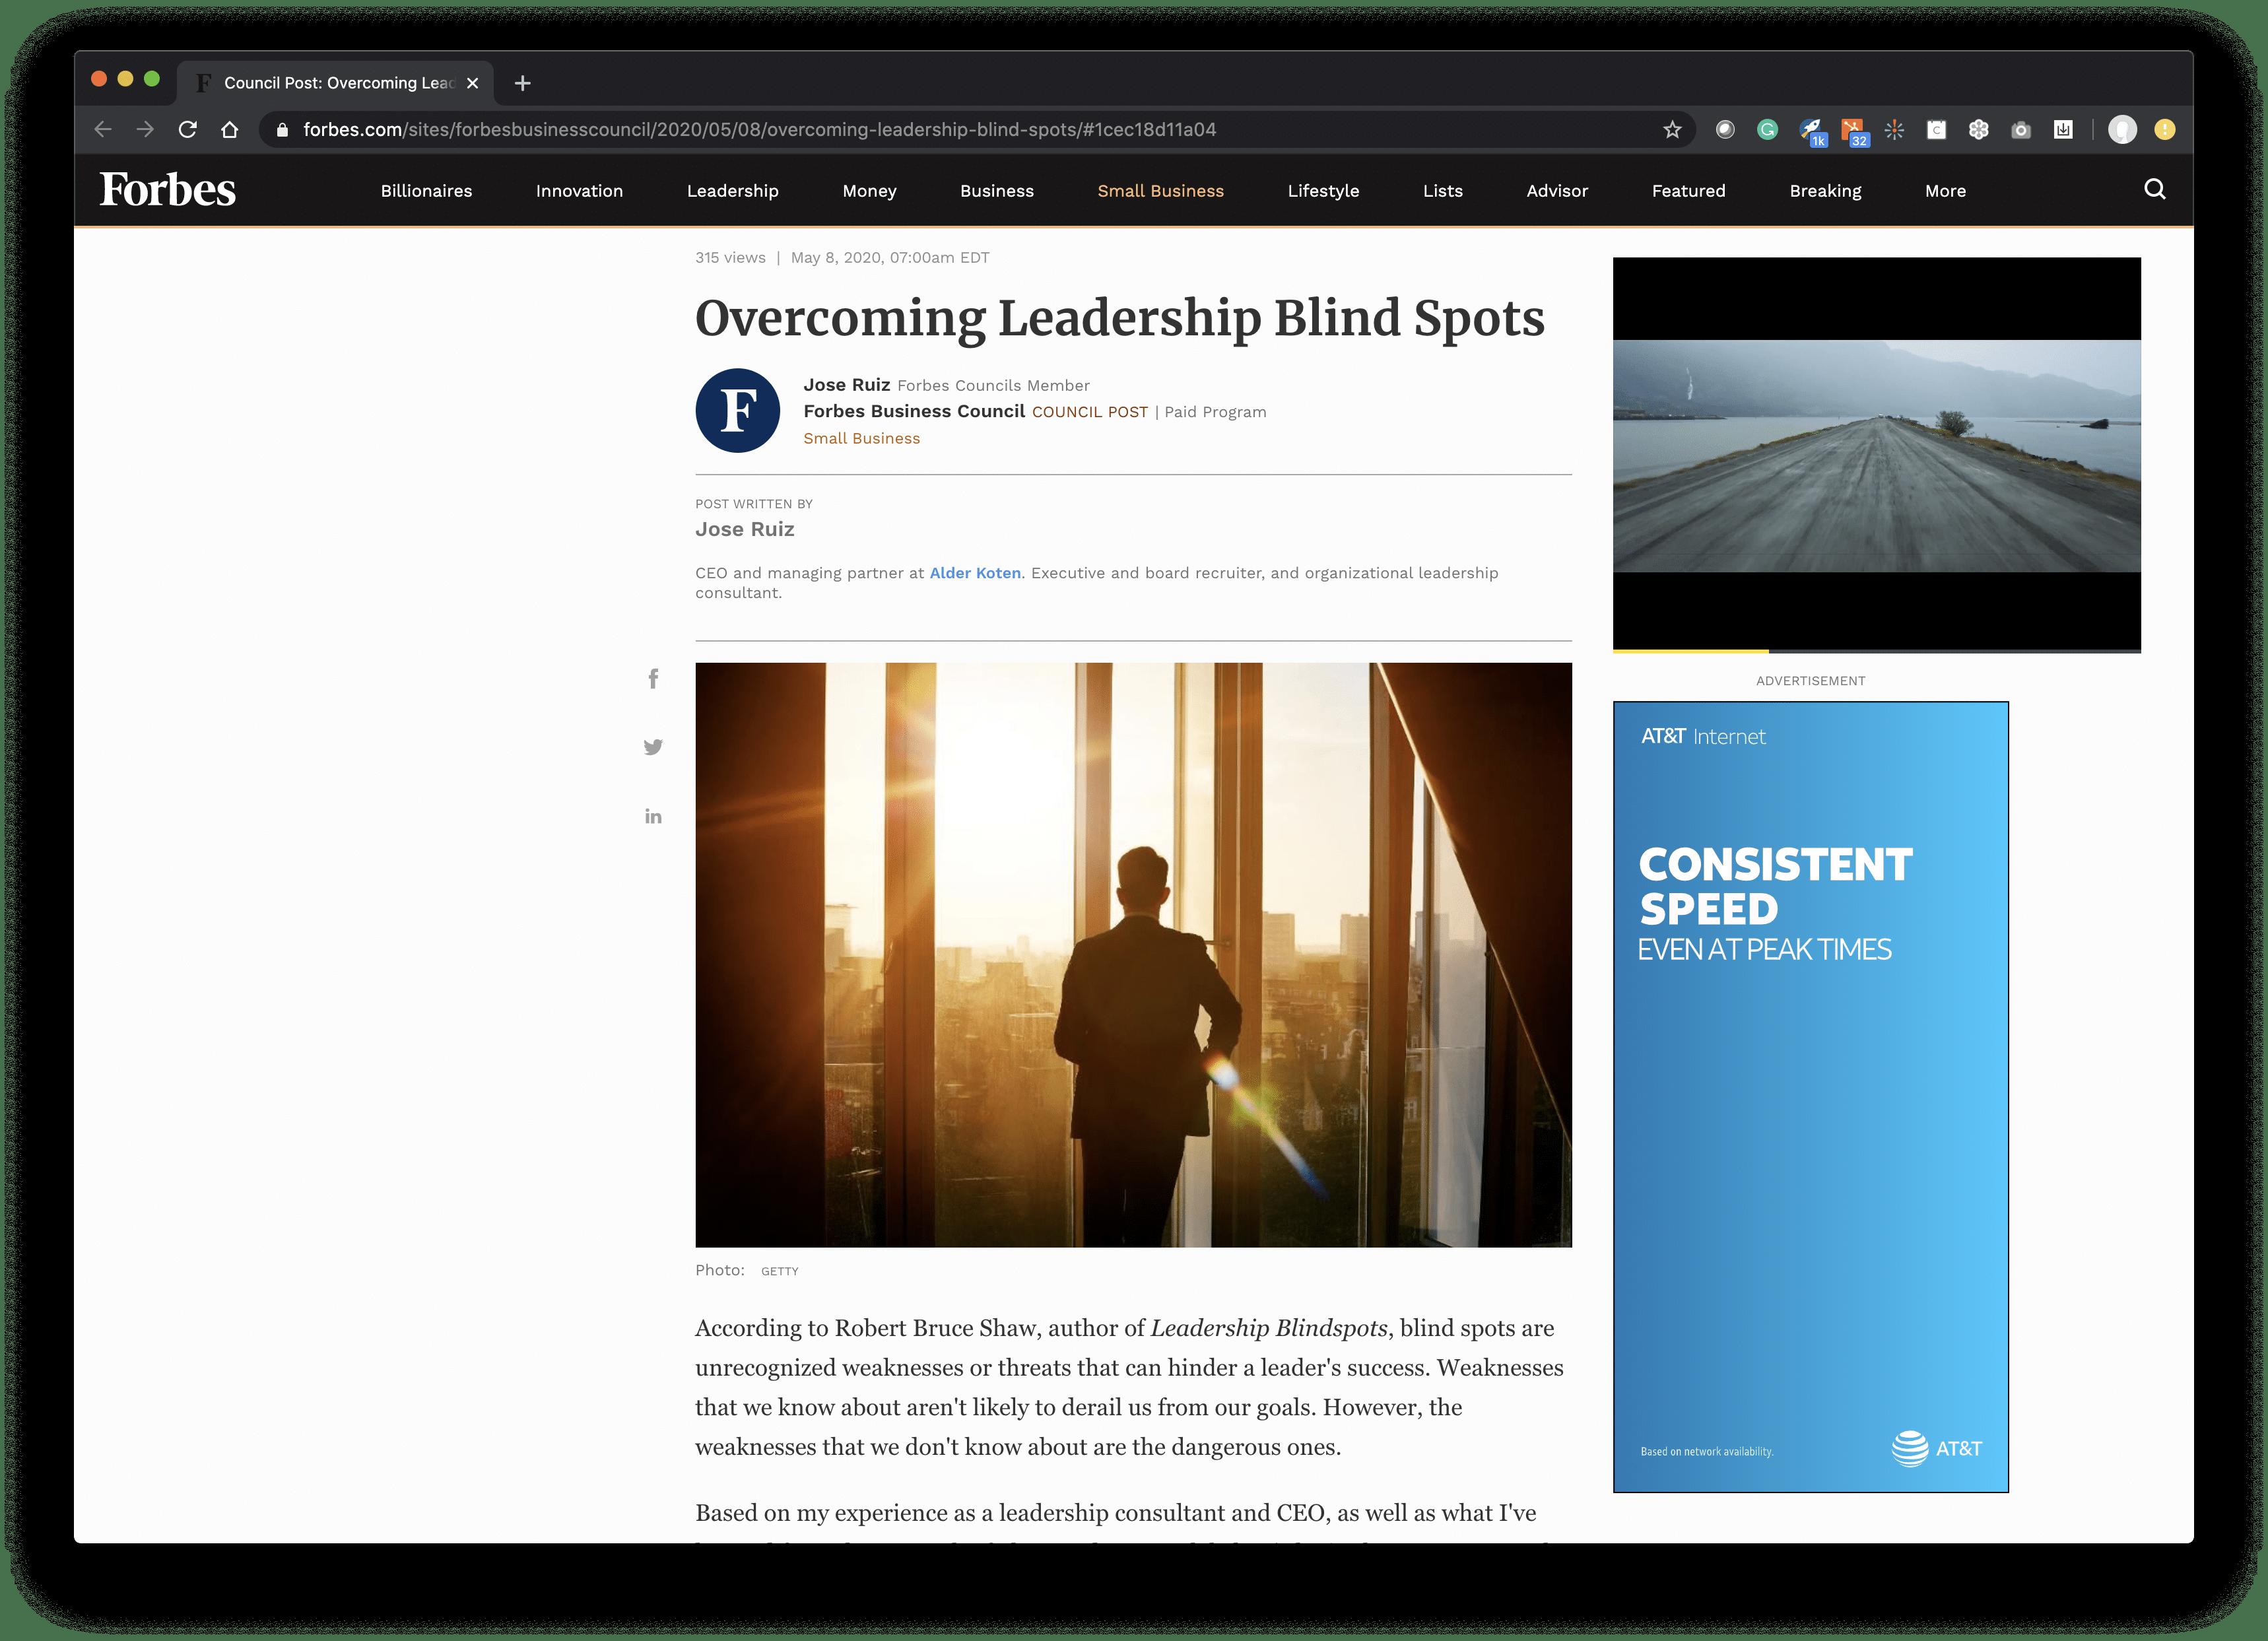 Overcoming Leadership Blind Spots